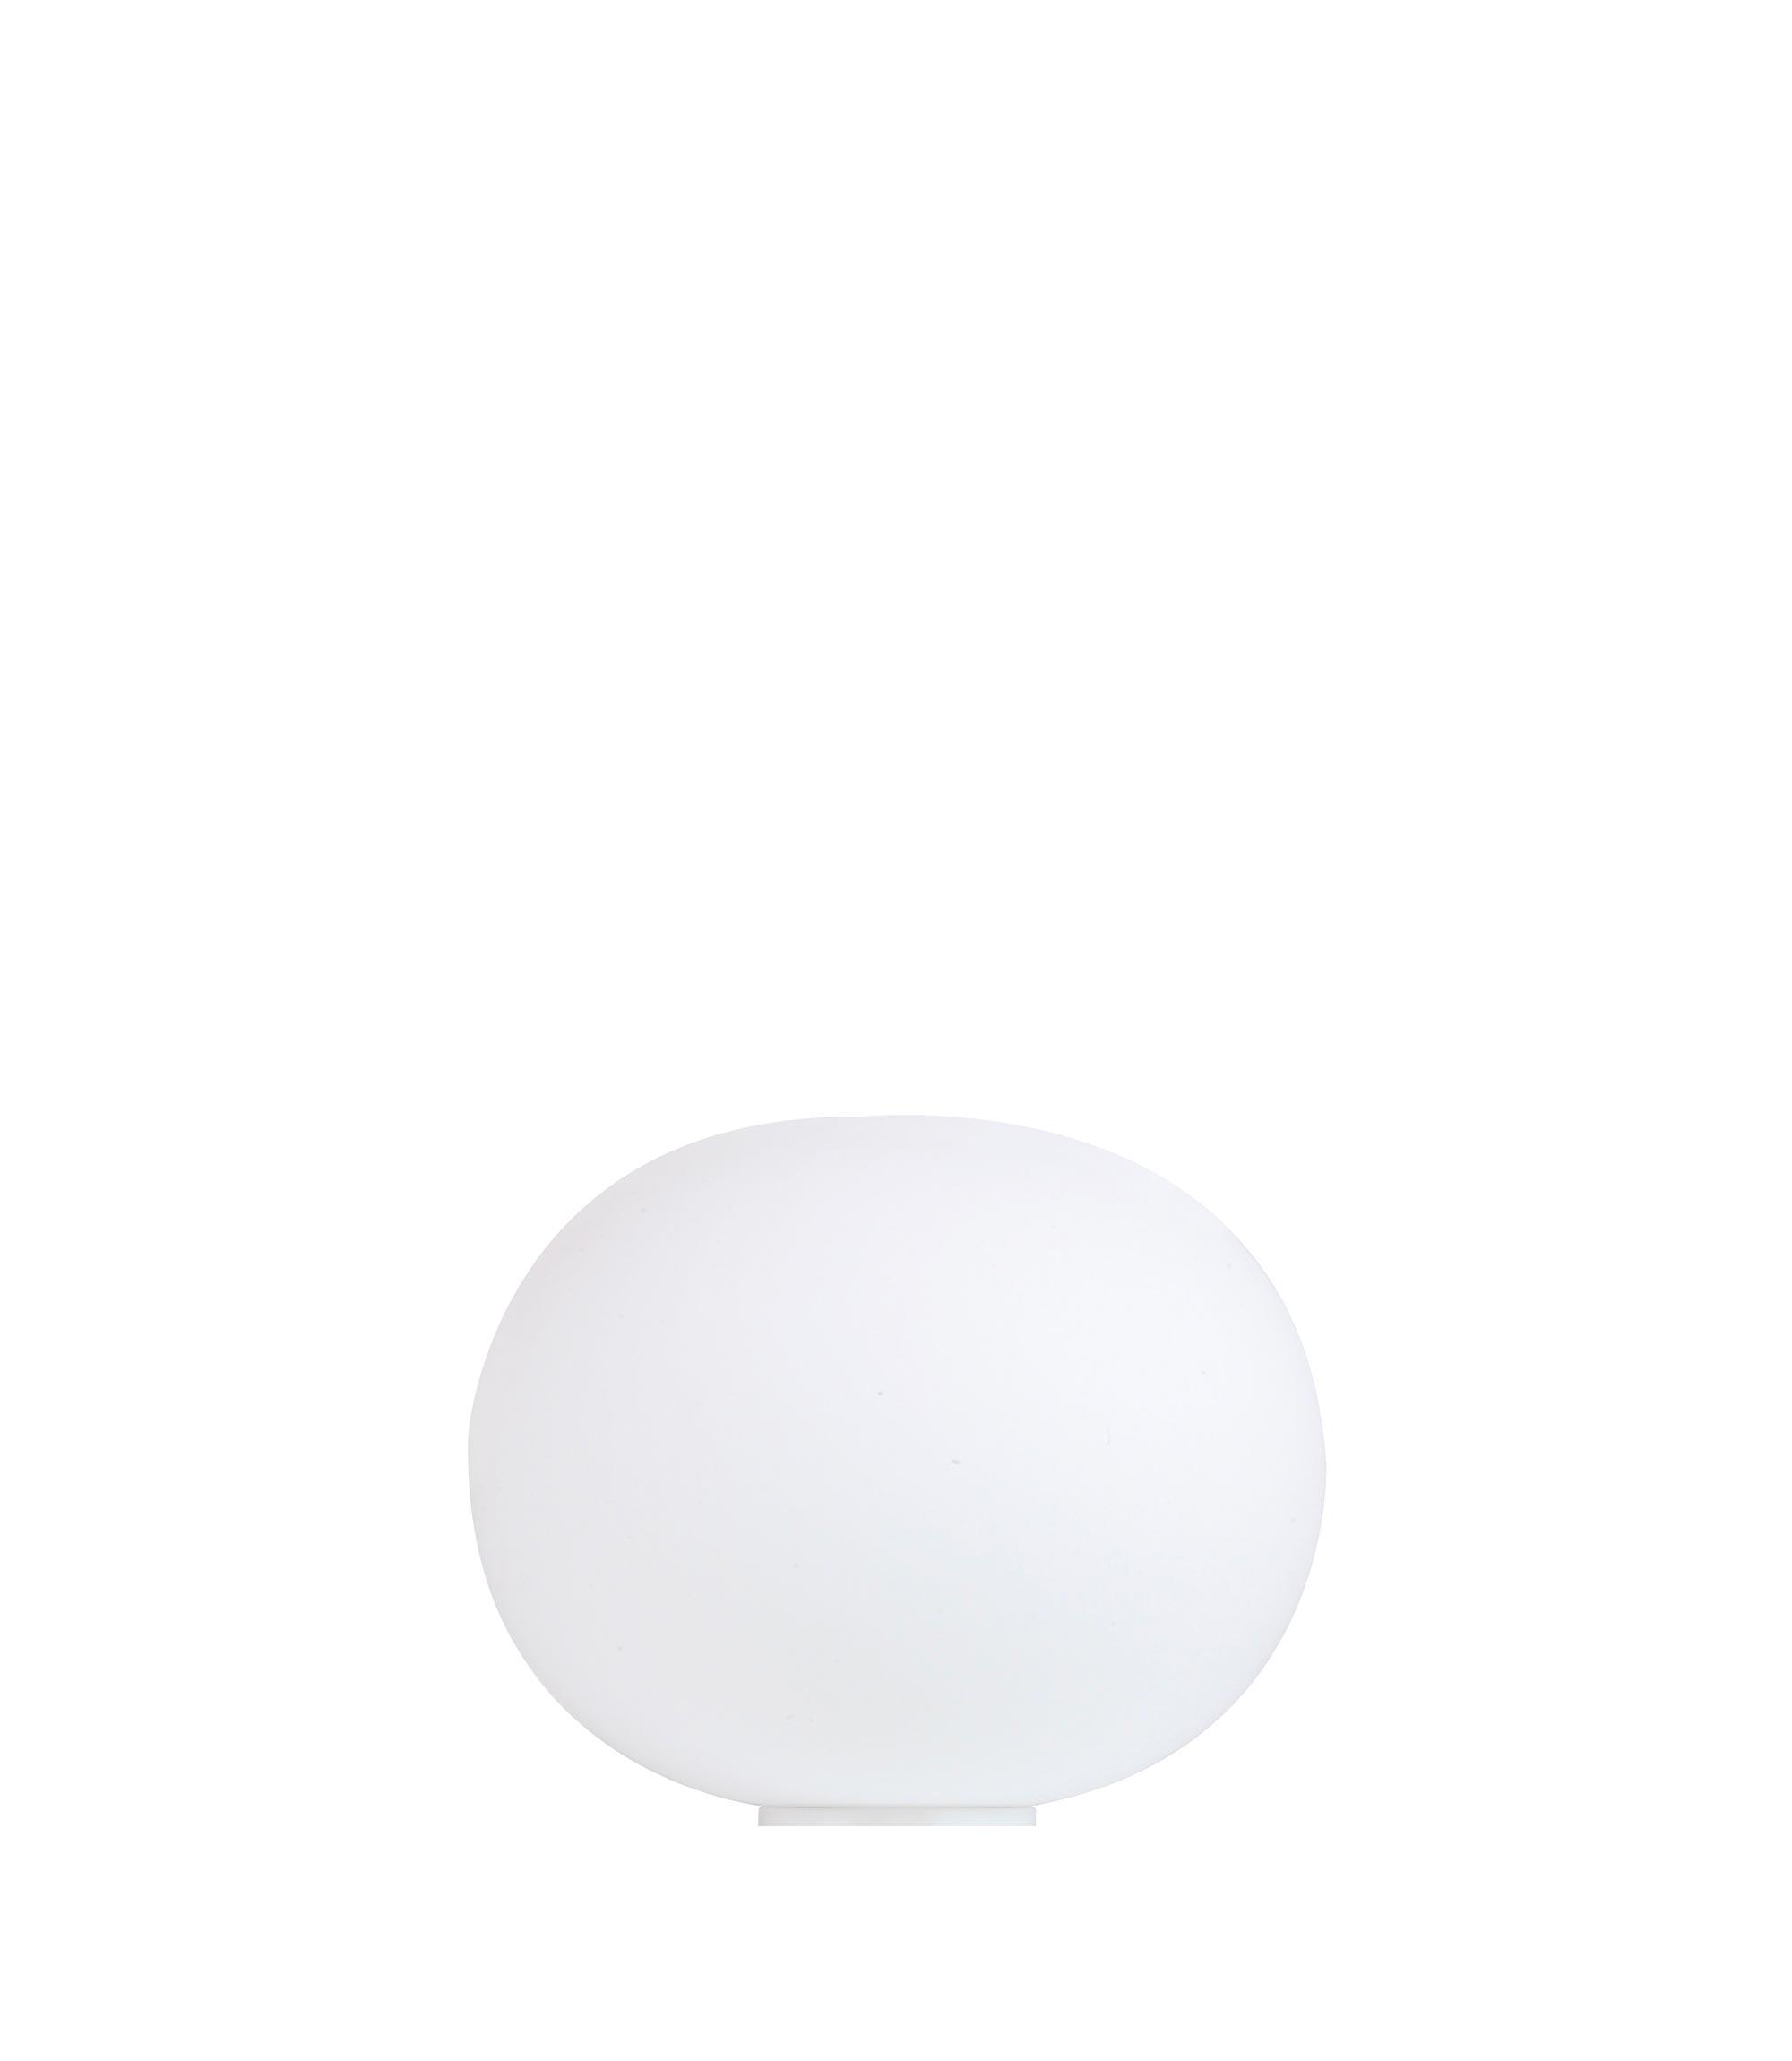 Glo ball basic table 1 morrison flos F3021000 product still life big 2